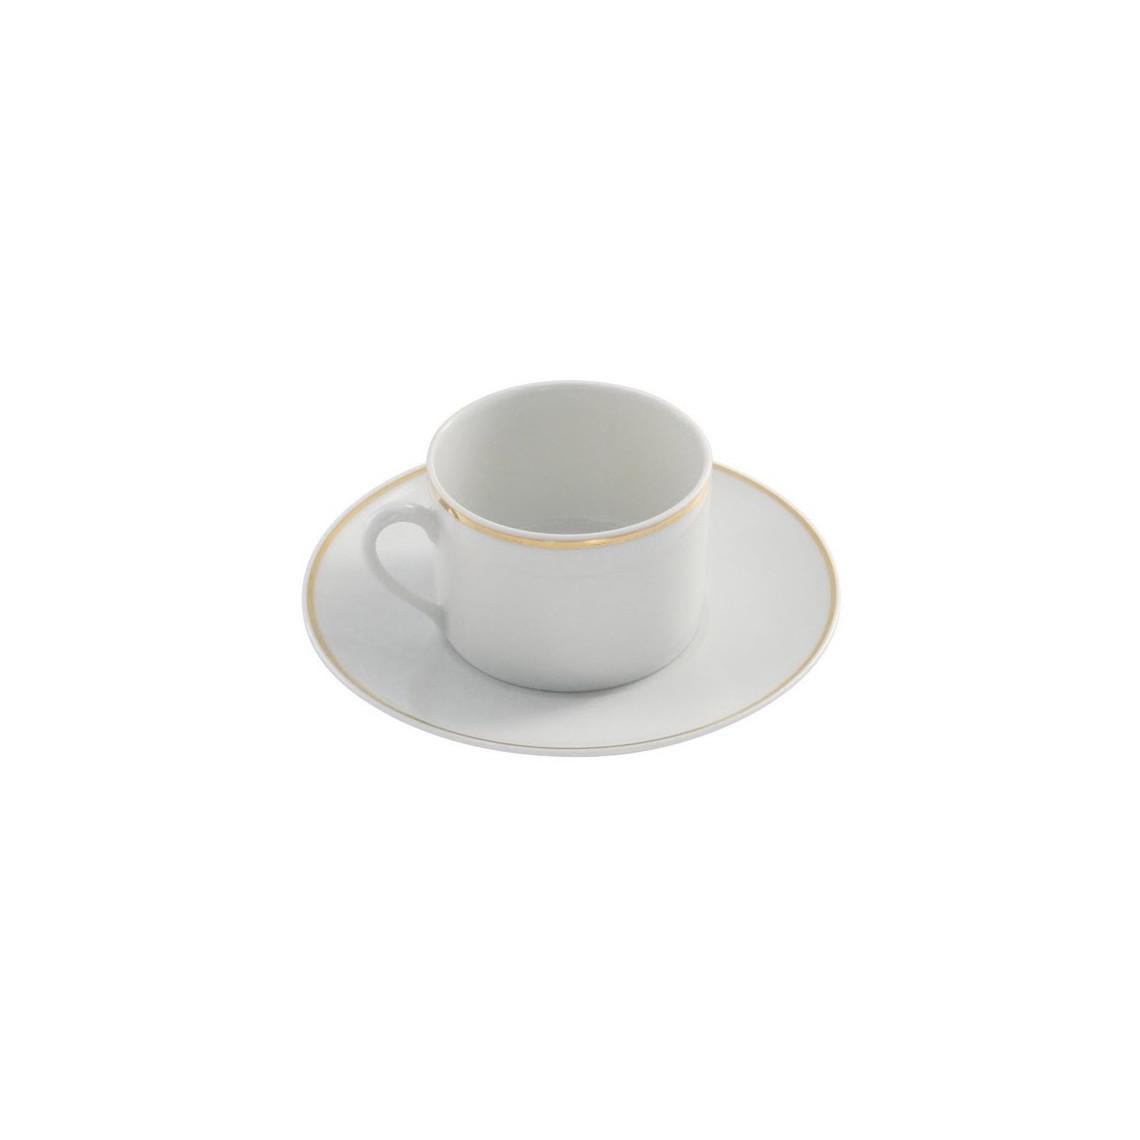 Tasse à thé Filet Or